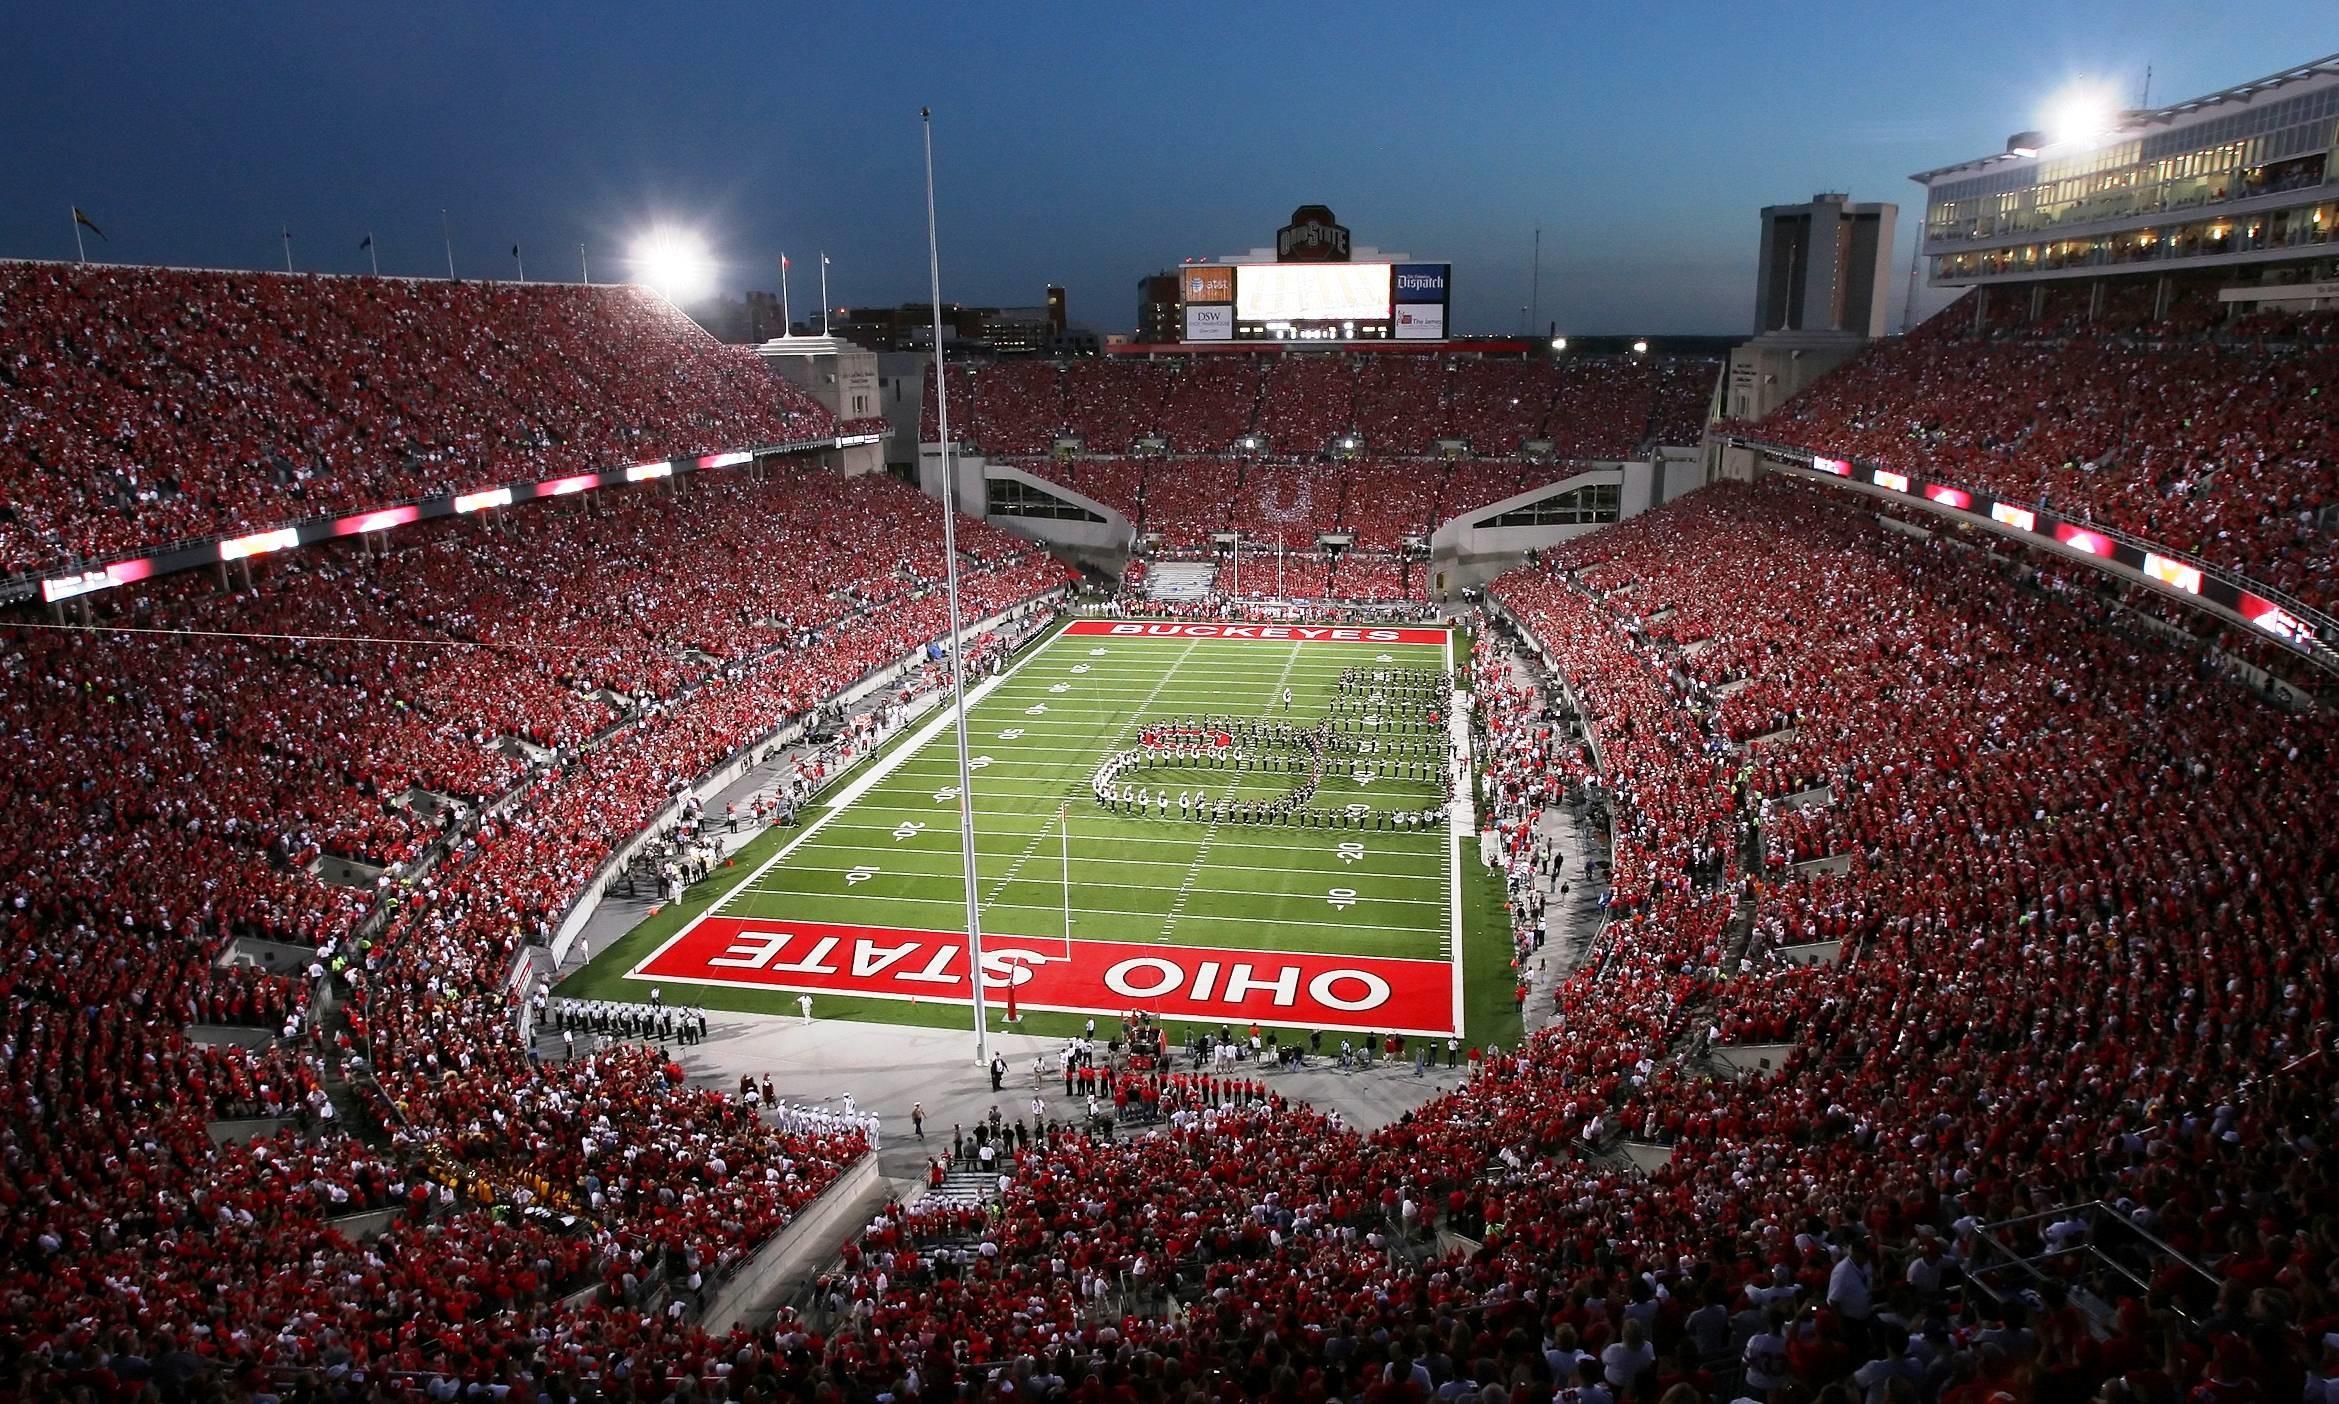 Football Wallpapers 23: Ohio State Buckeyes Football Wallpaper ·① WallpaperTag